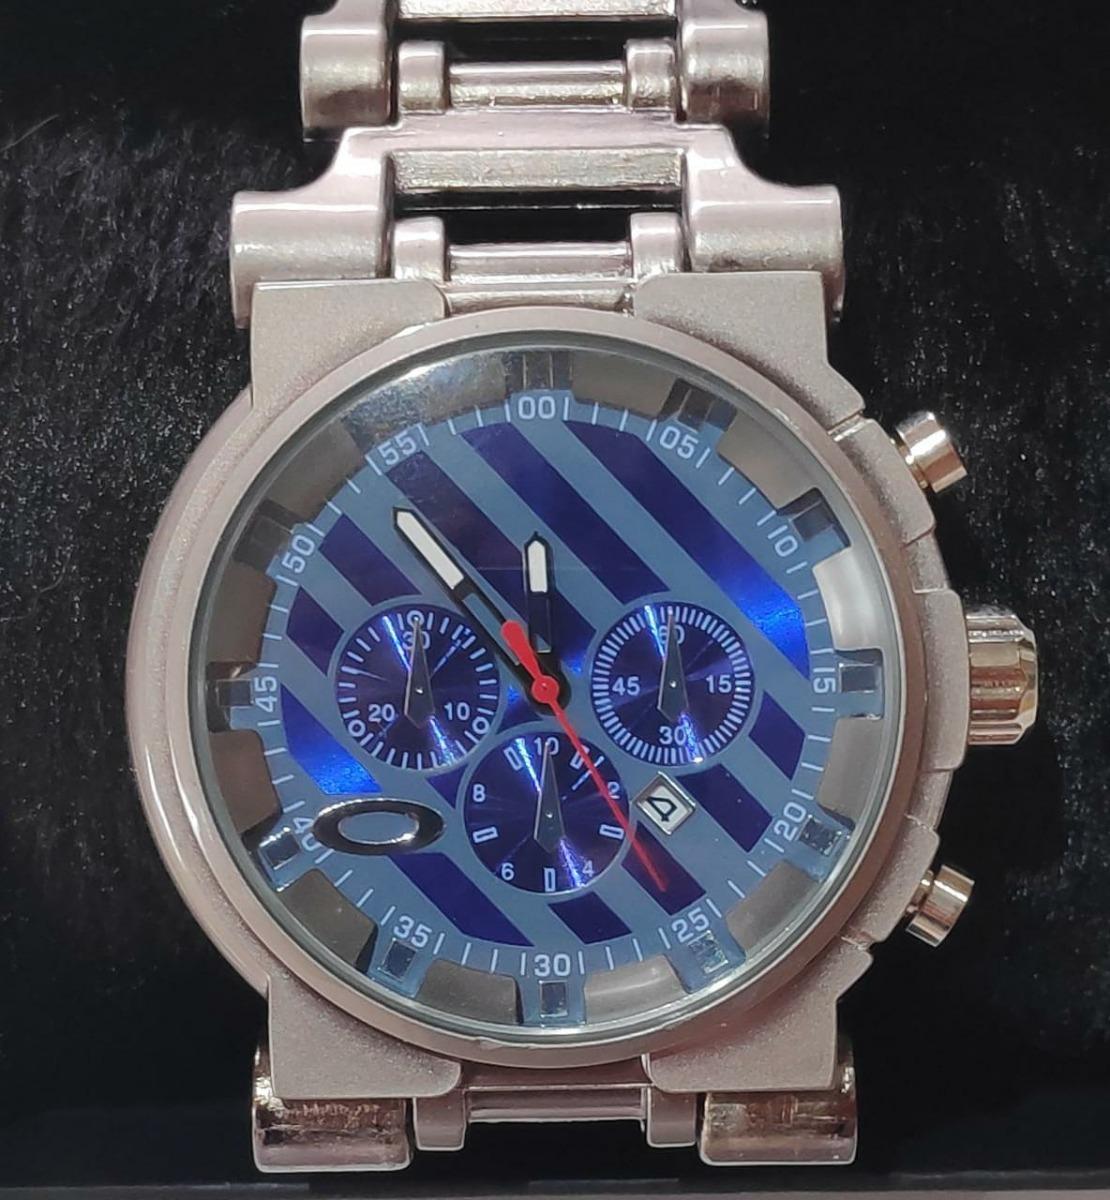 4ca506f14e0 relógio masculino oaklei tank hollow minute gearbox titanium. Carregando  zoom.